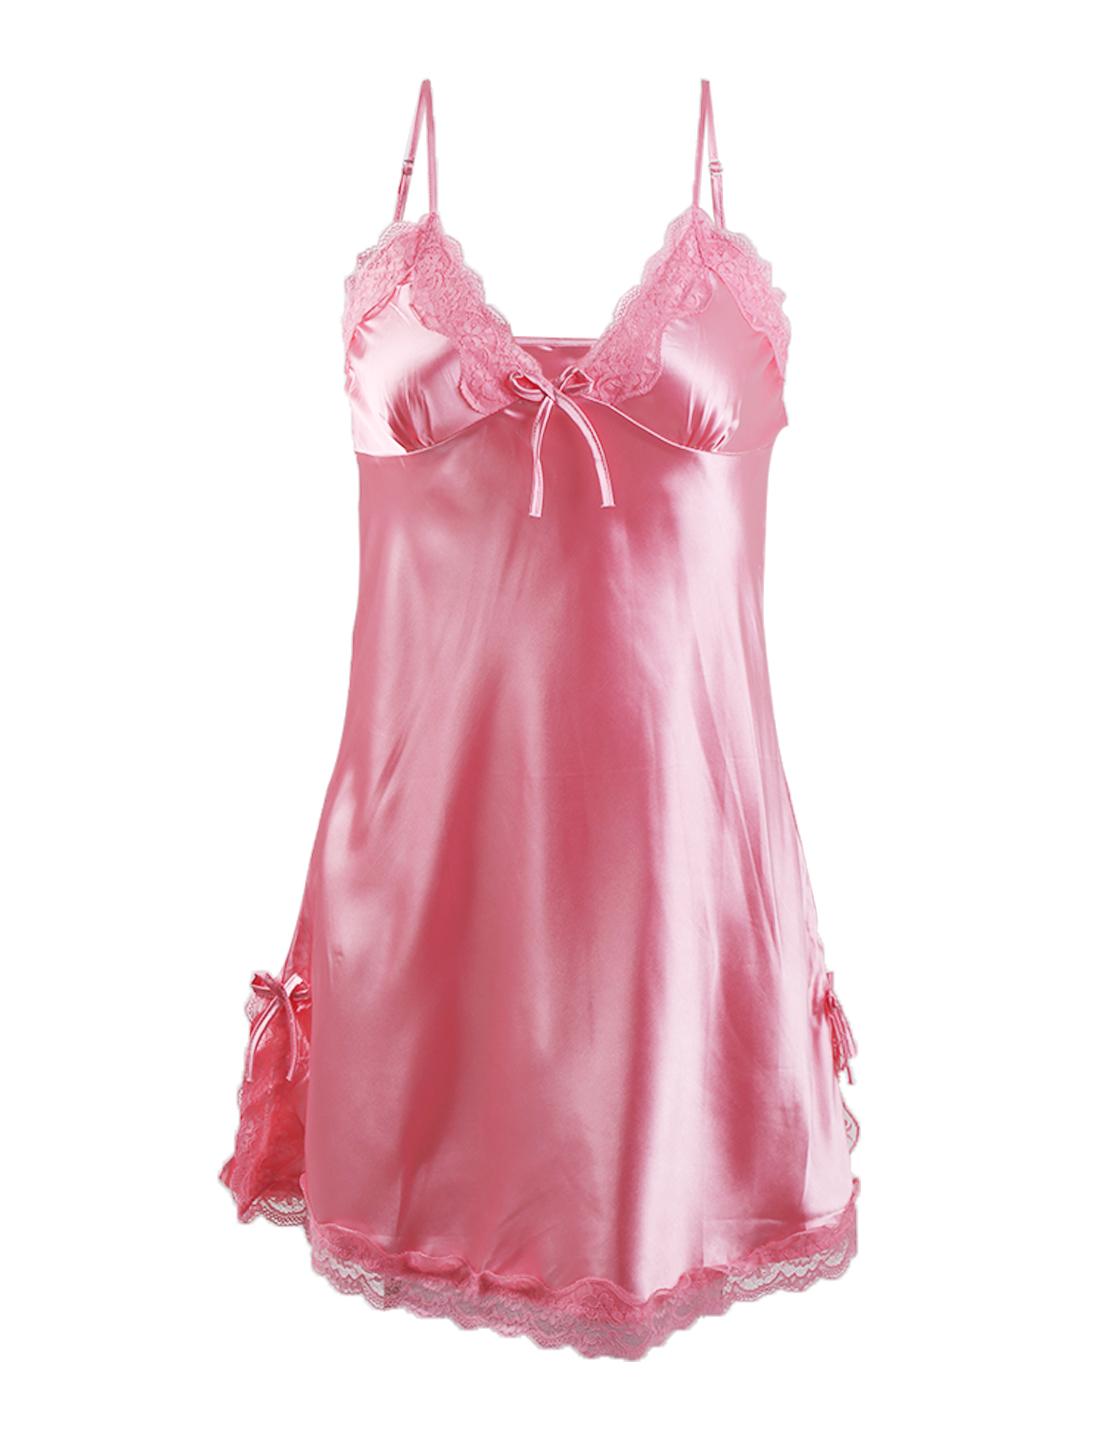 Women Sexy Satin Lace Trim Sleepwear Nightgown Pajama Slip Dress Pink-Lace L